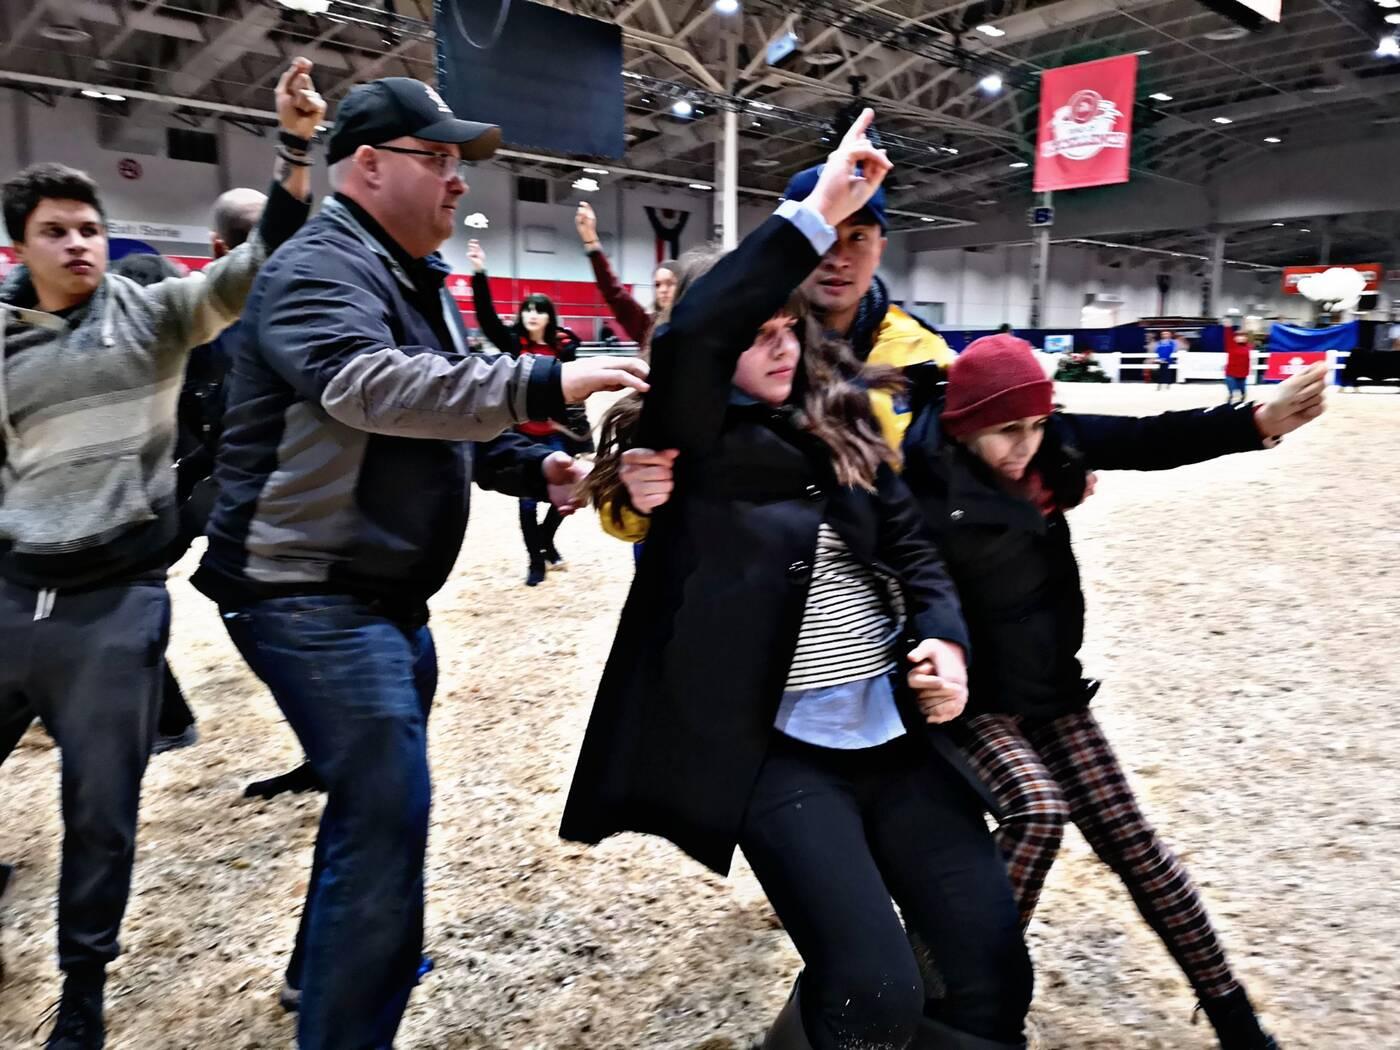 royal winter fair protest